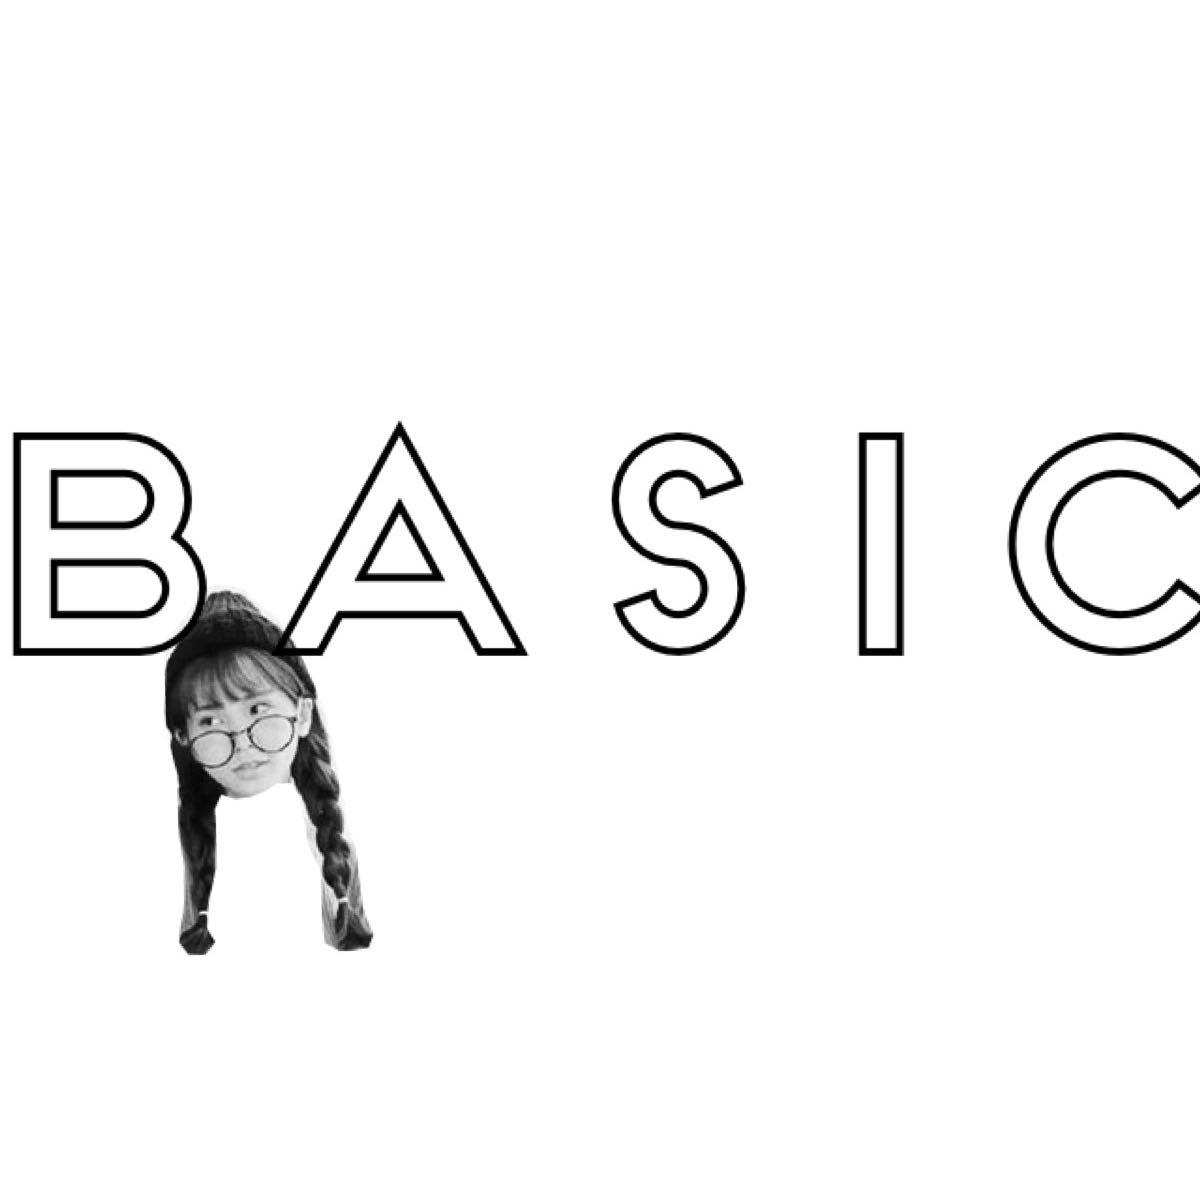 basicgirl